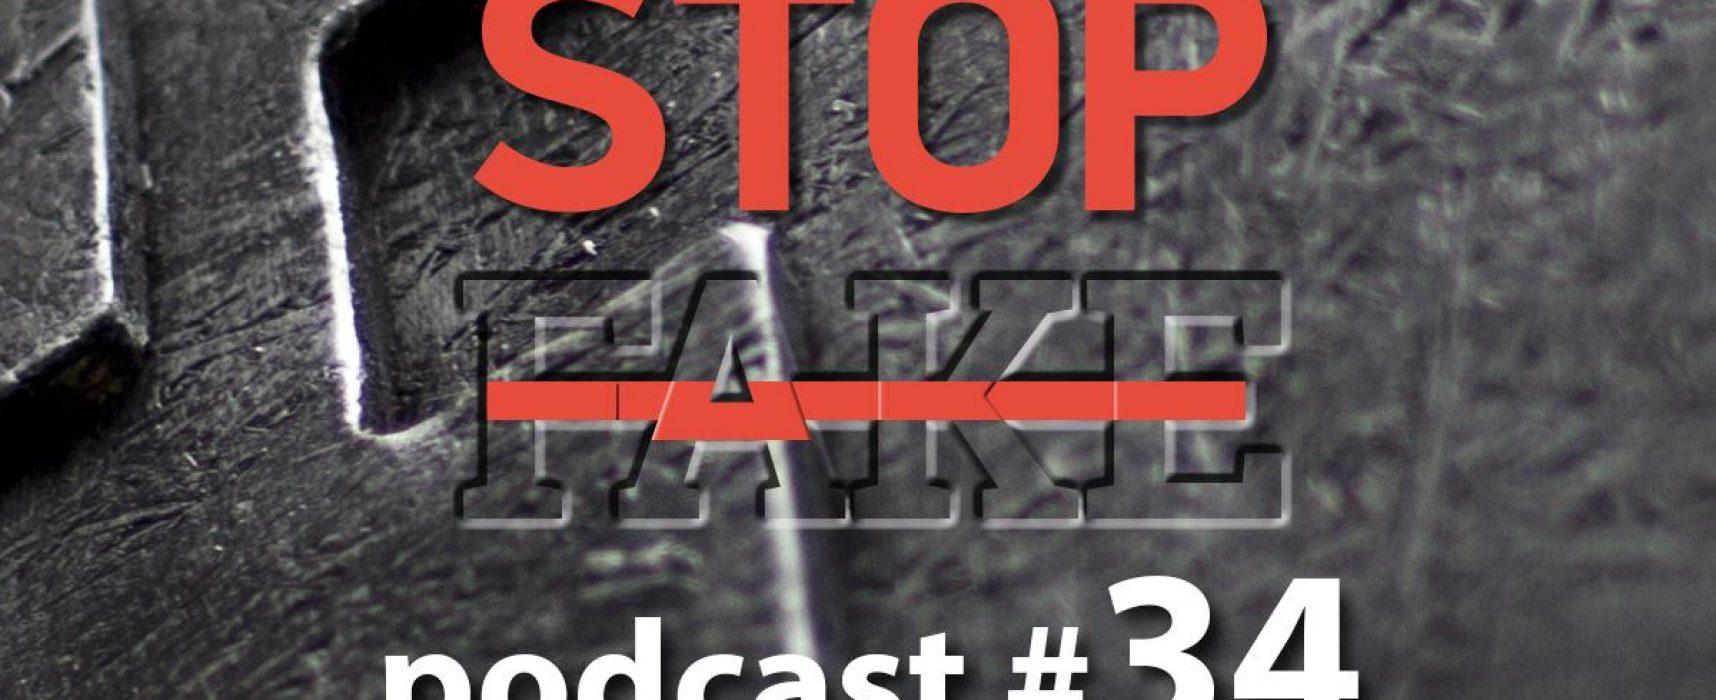 StopFake podcast # 34